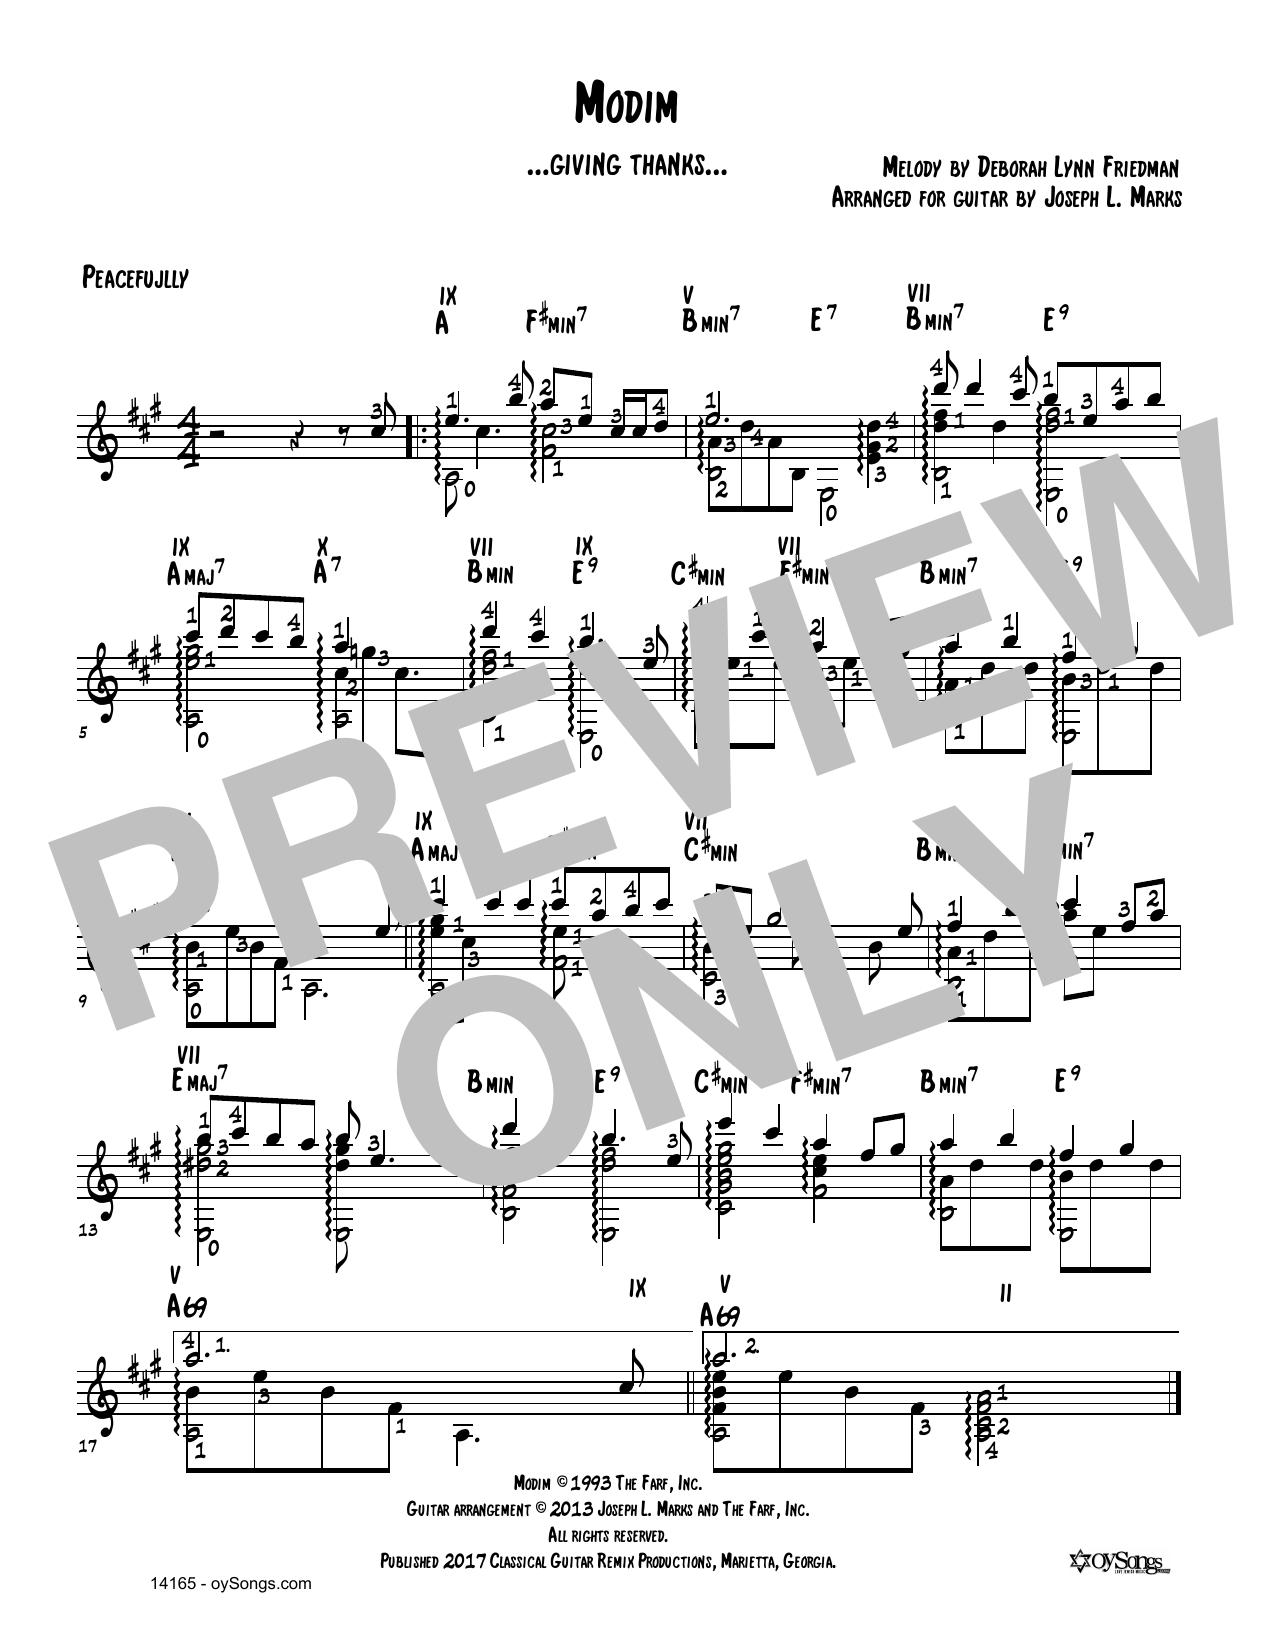 Debbie Friedman Modim (arr. Joe Marks) sheet music notes and chords. Download Printable PDF.